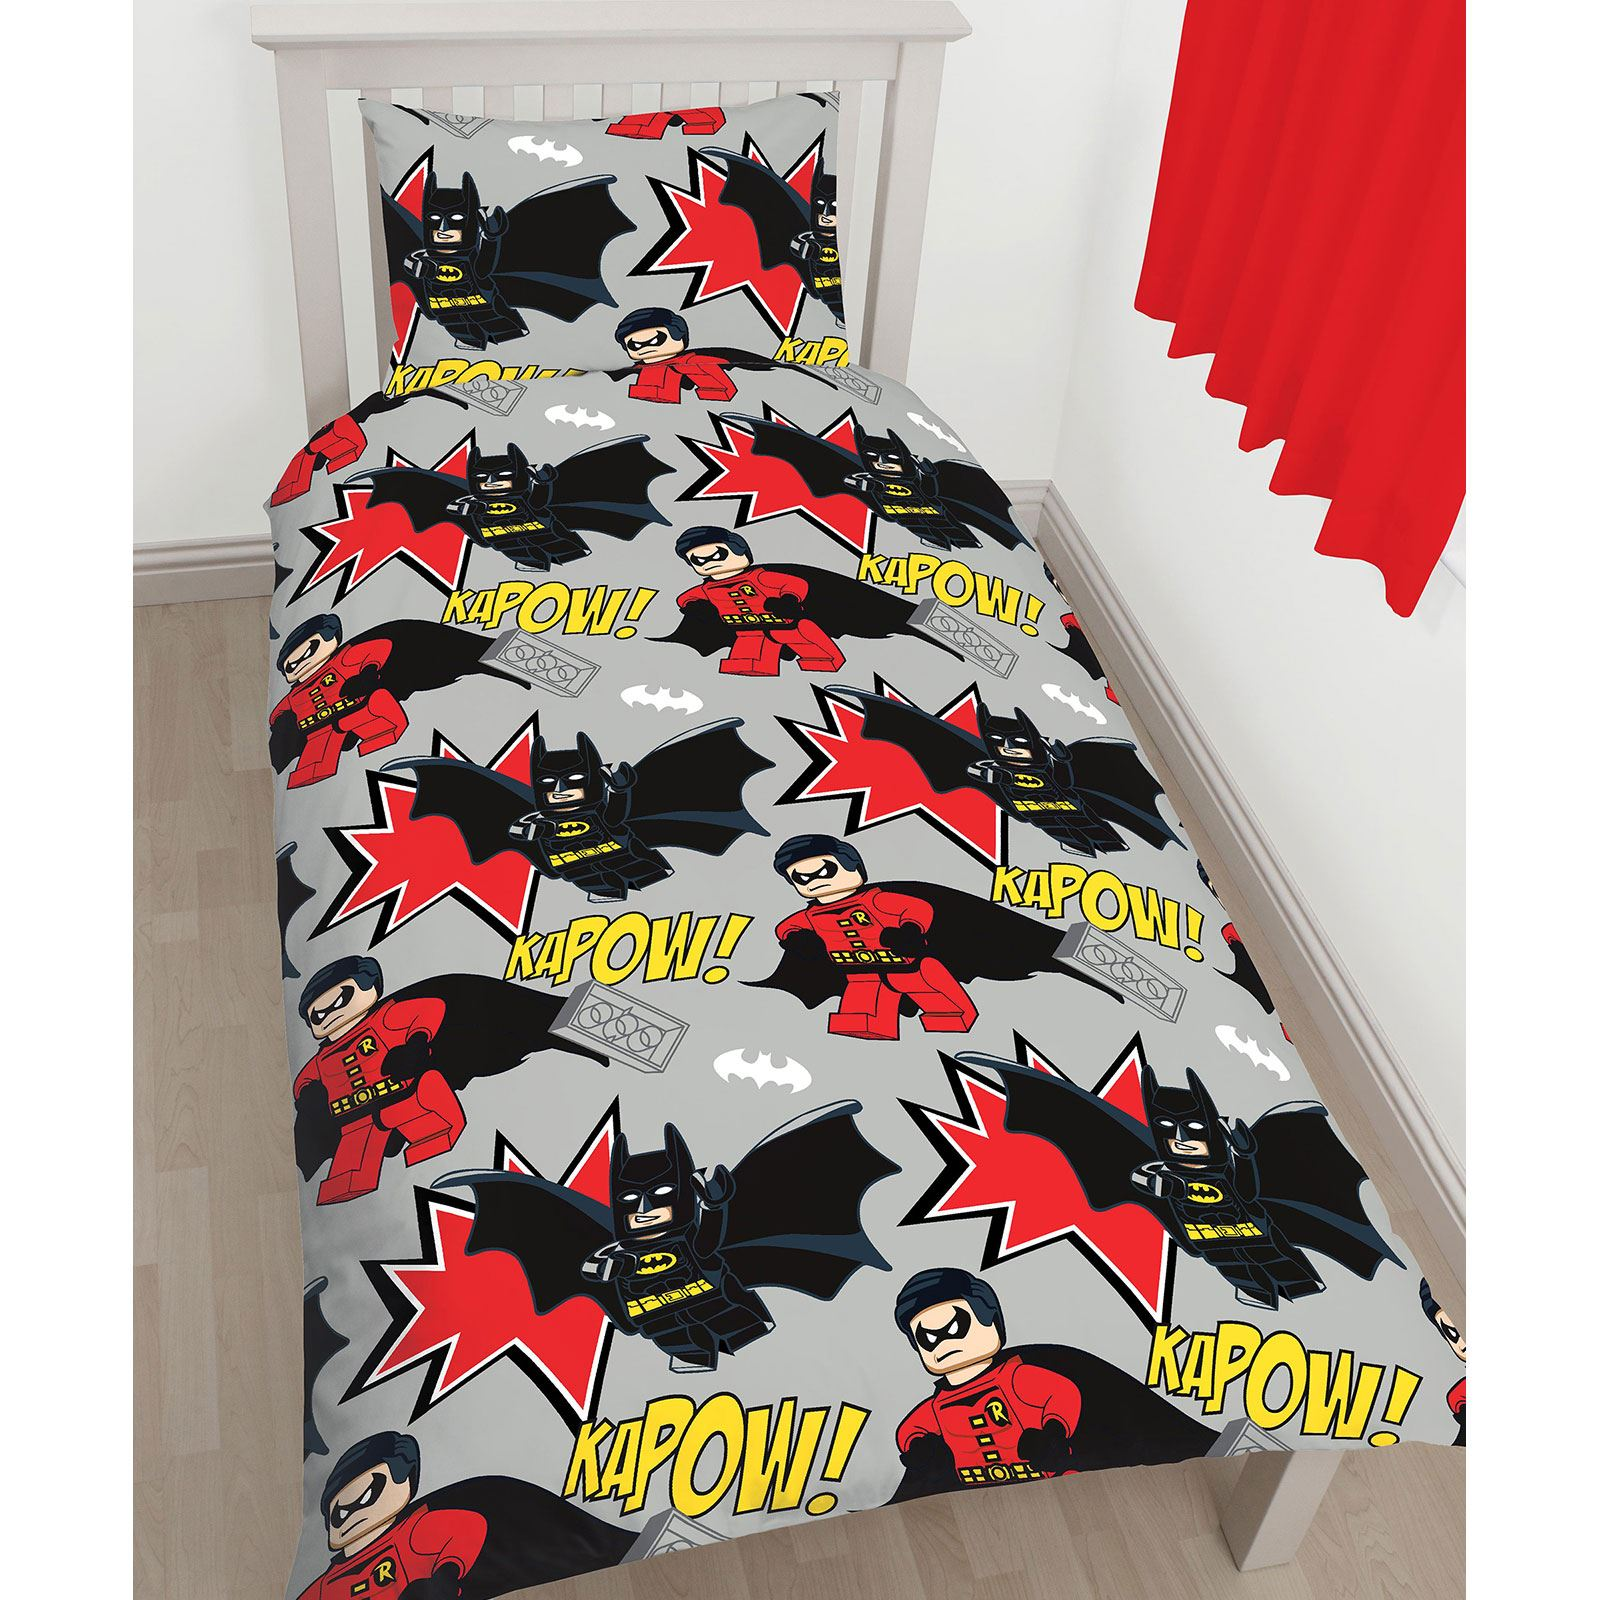 OFFICIAL LEGO DC SUPERHEROES BATMAN KAPOW TWIN DUVET COVER SET